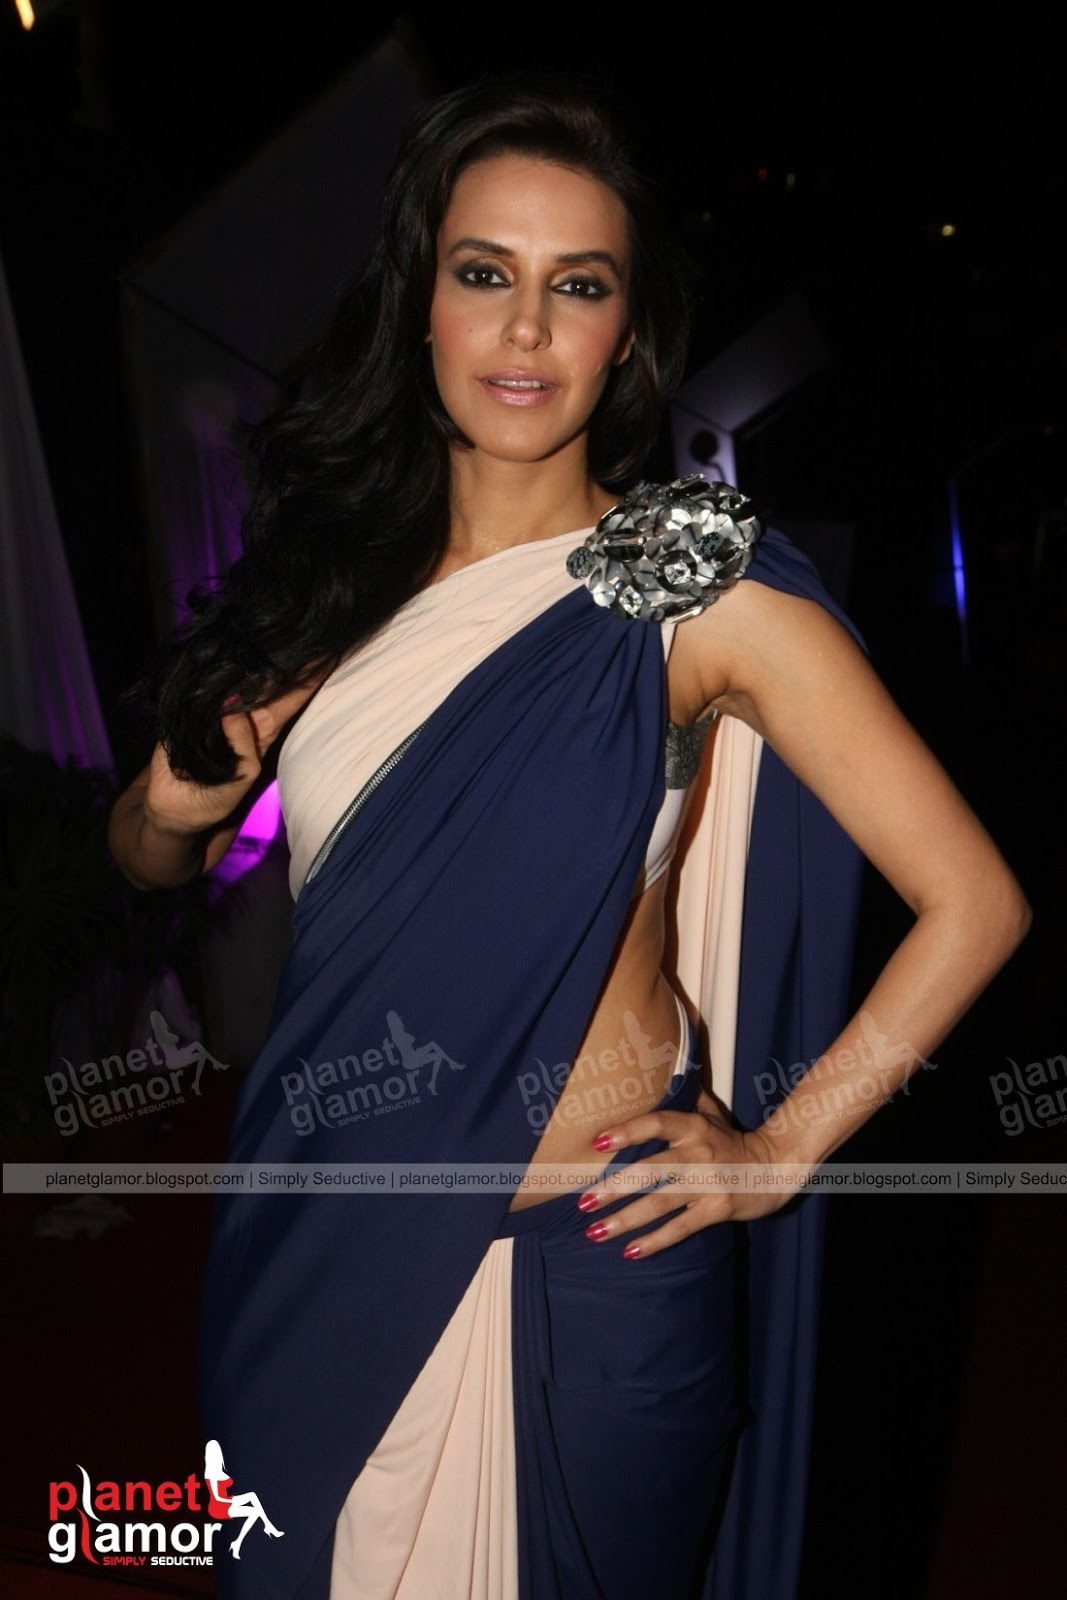 planet glamor neha dhupia white bra hook revealing saree